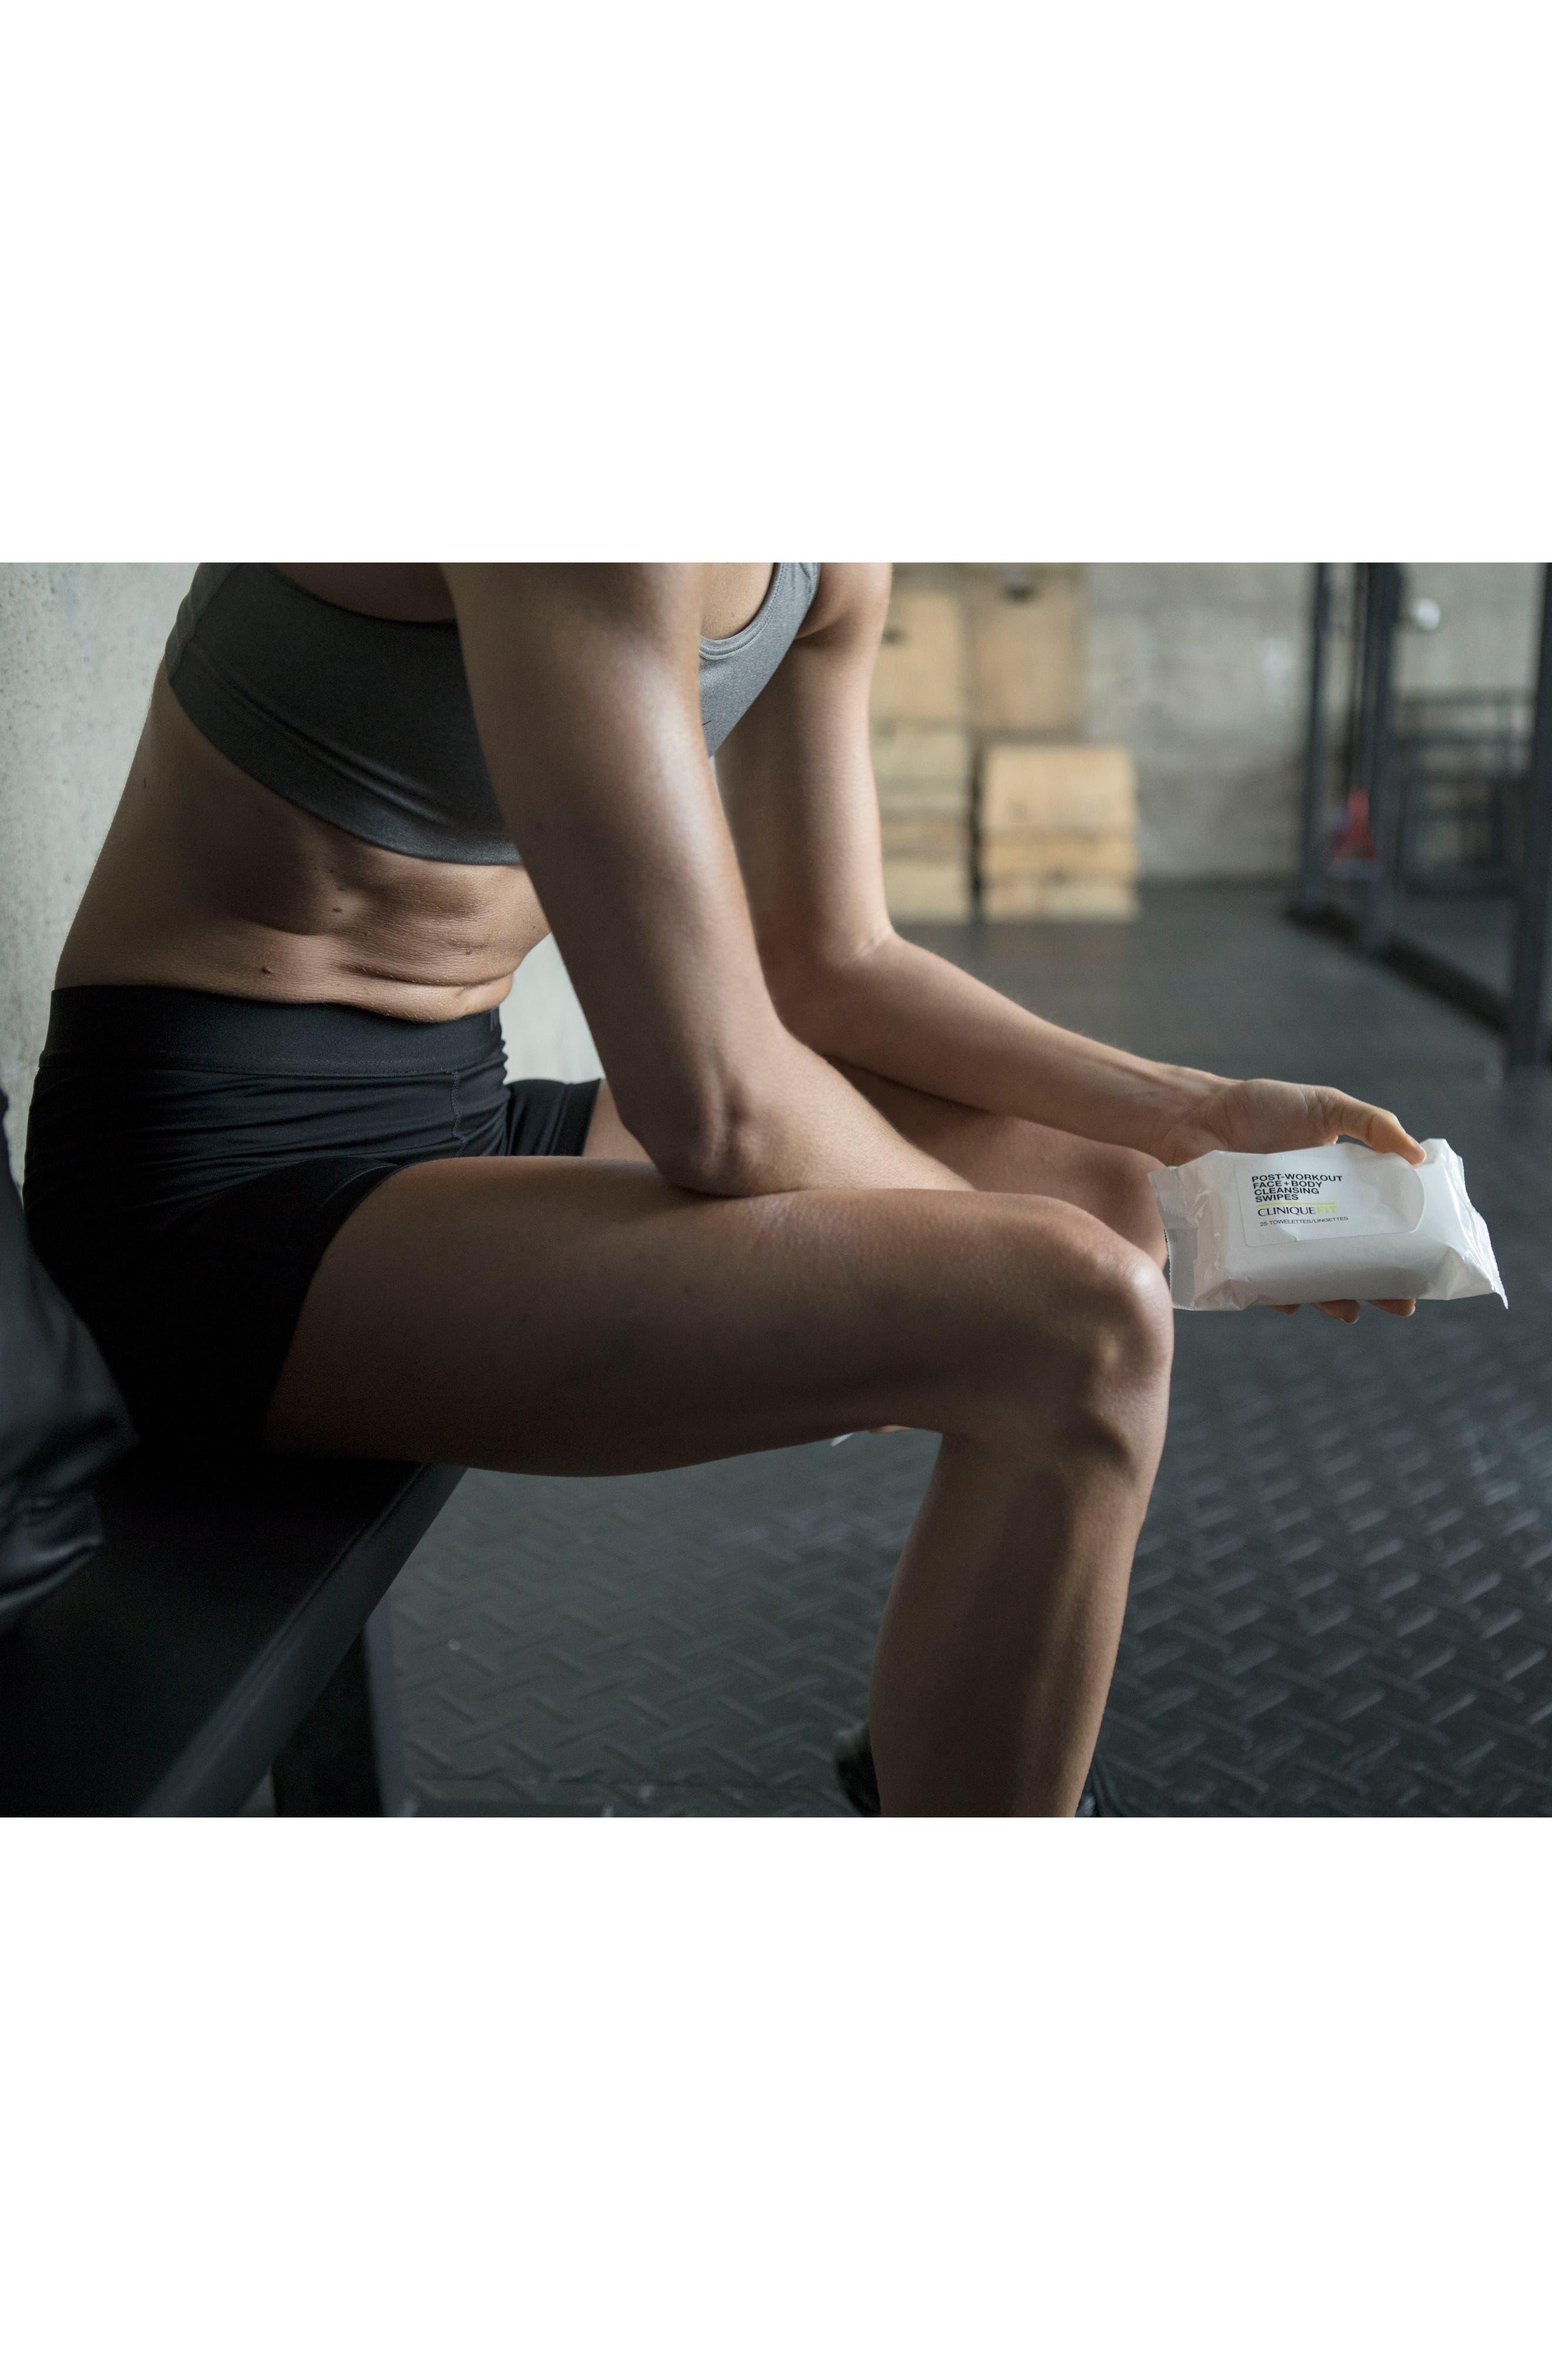 CliniqueFIT Post-Workout Face + Body Cleansing Swipes,                             Alternate thumbnail 9, color,                             NO COLOR